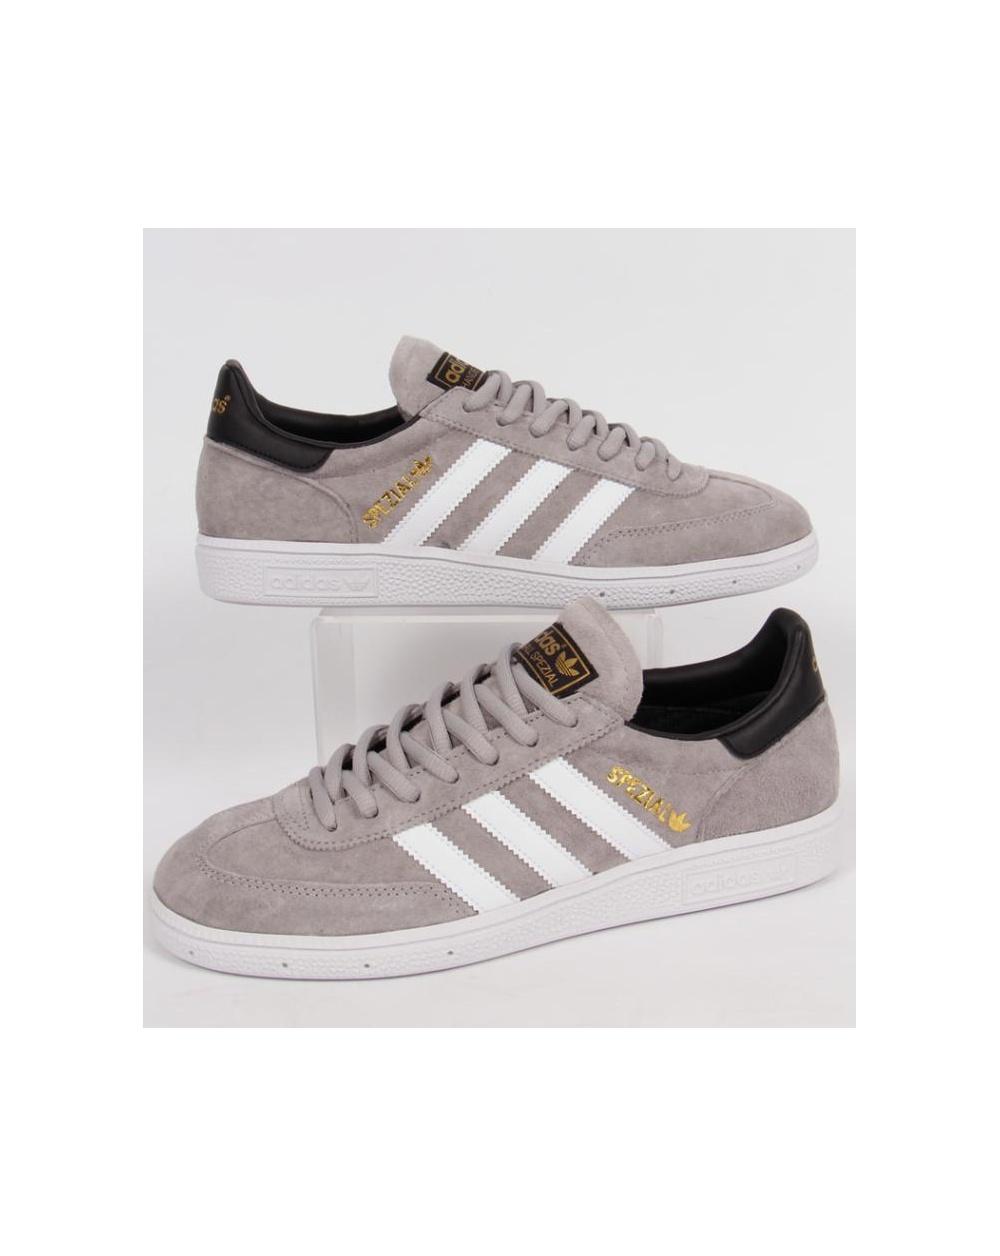 adidas originals spezial trainers grey